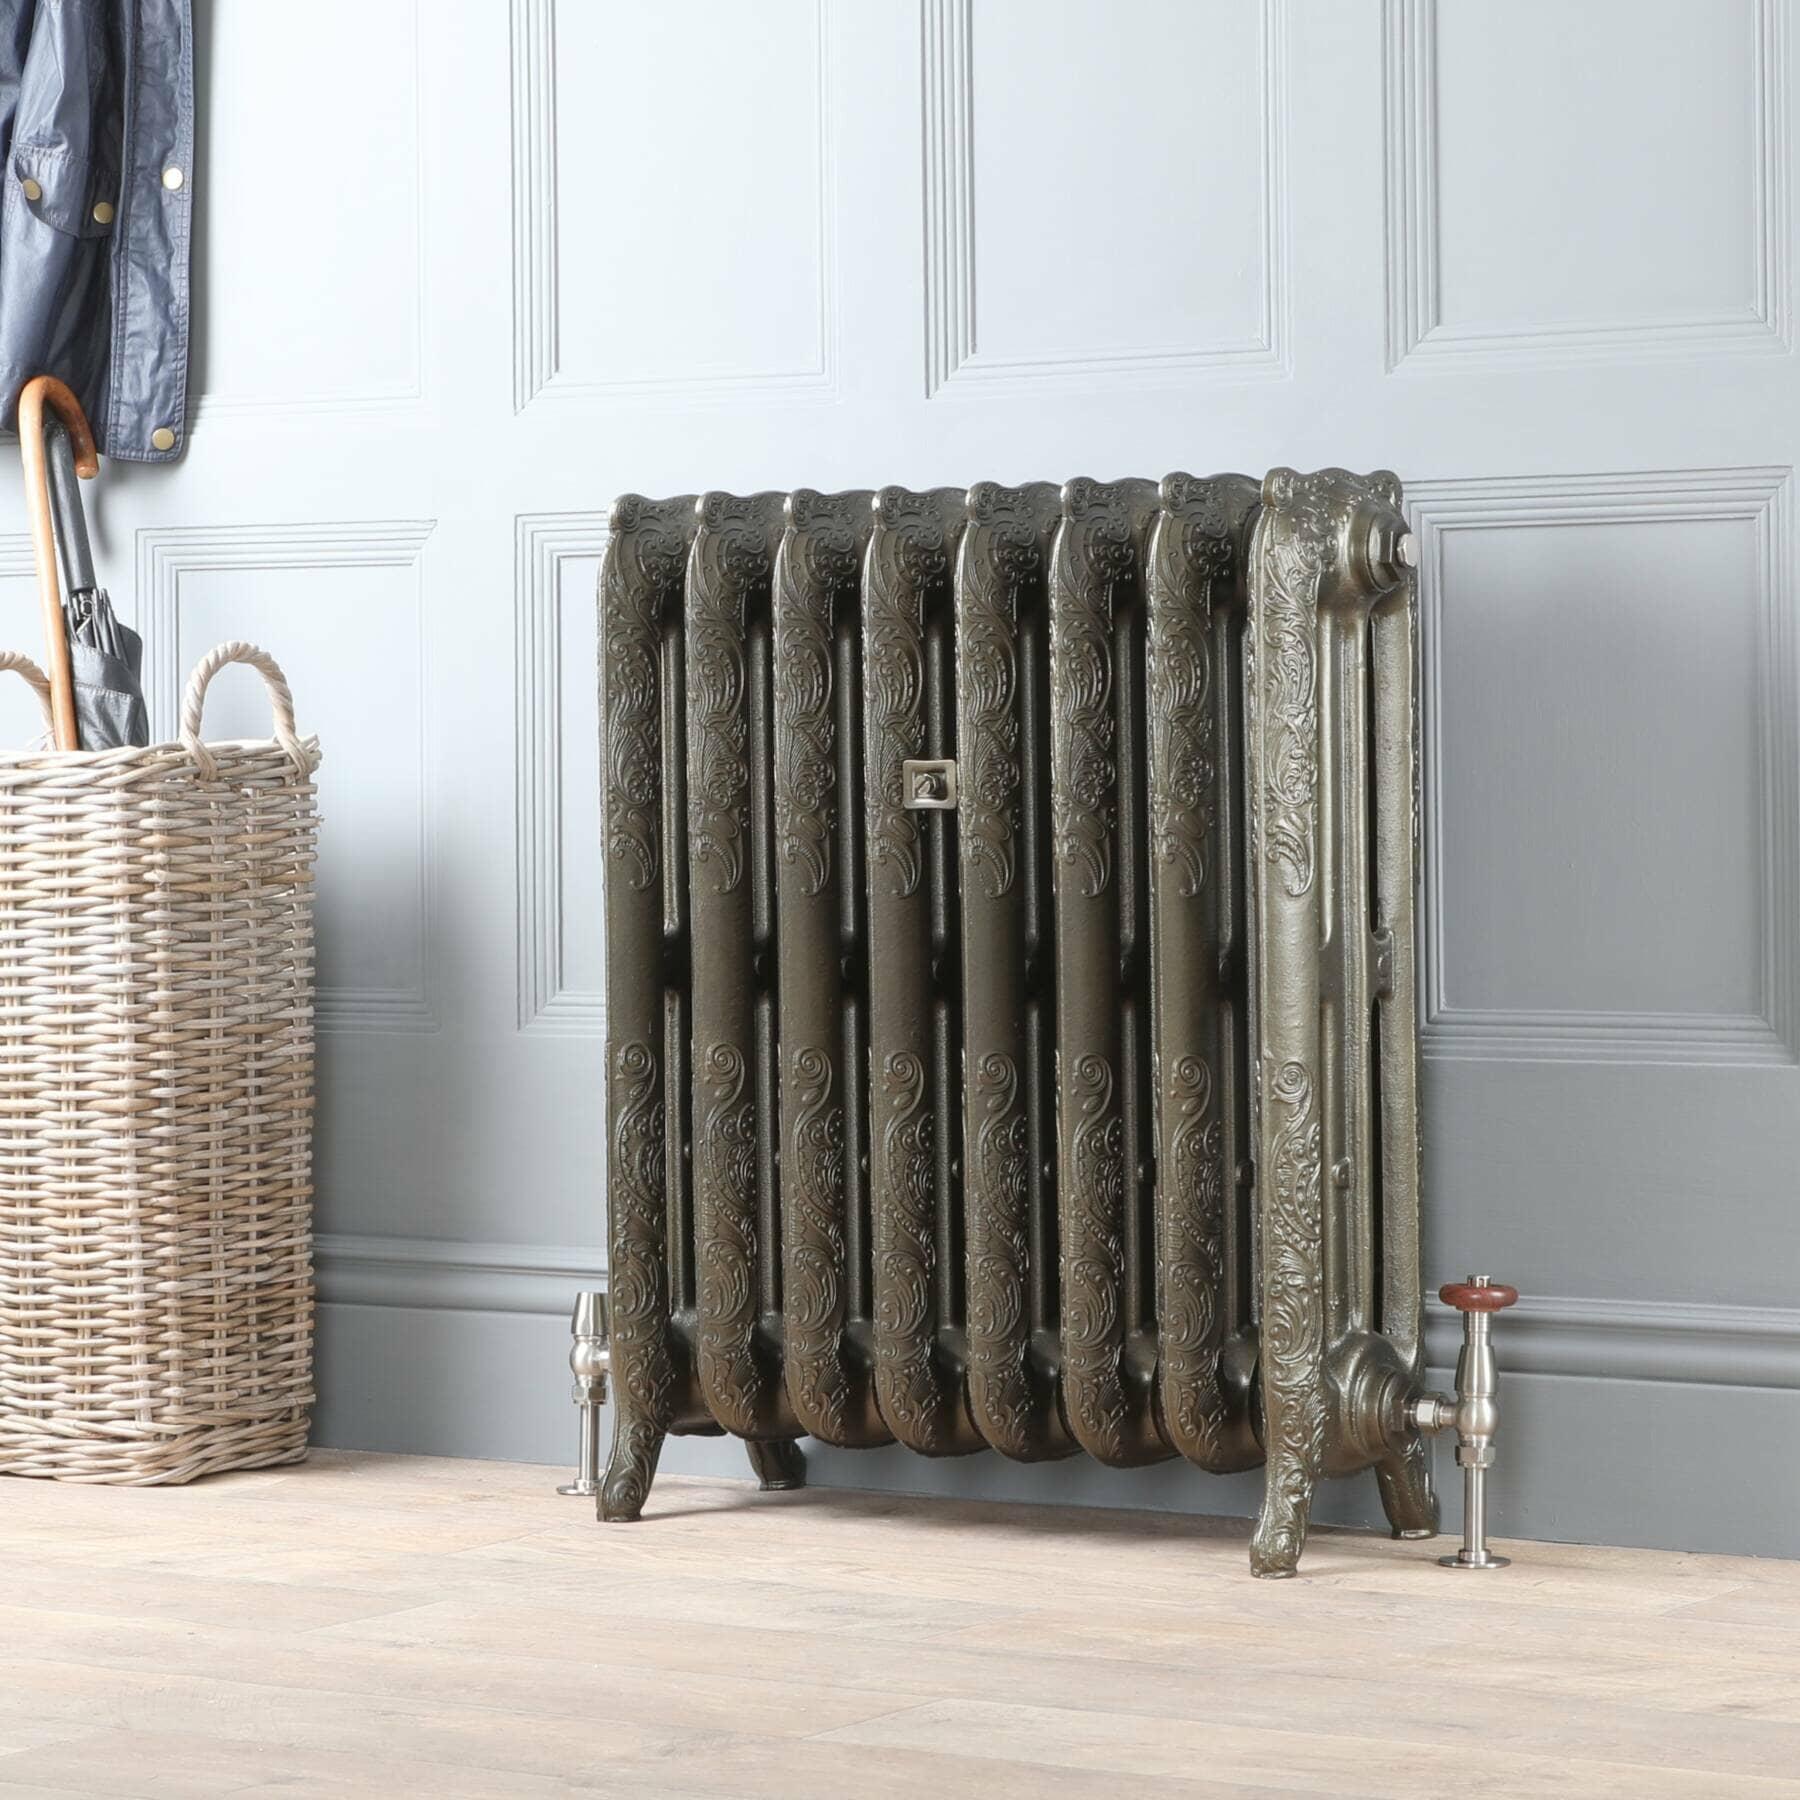 Milano Beatrix cast iron radiator in a hallway